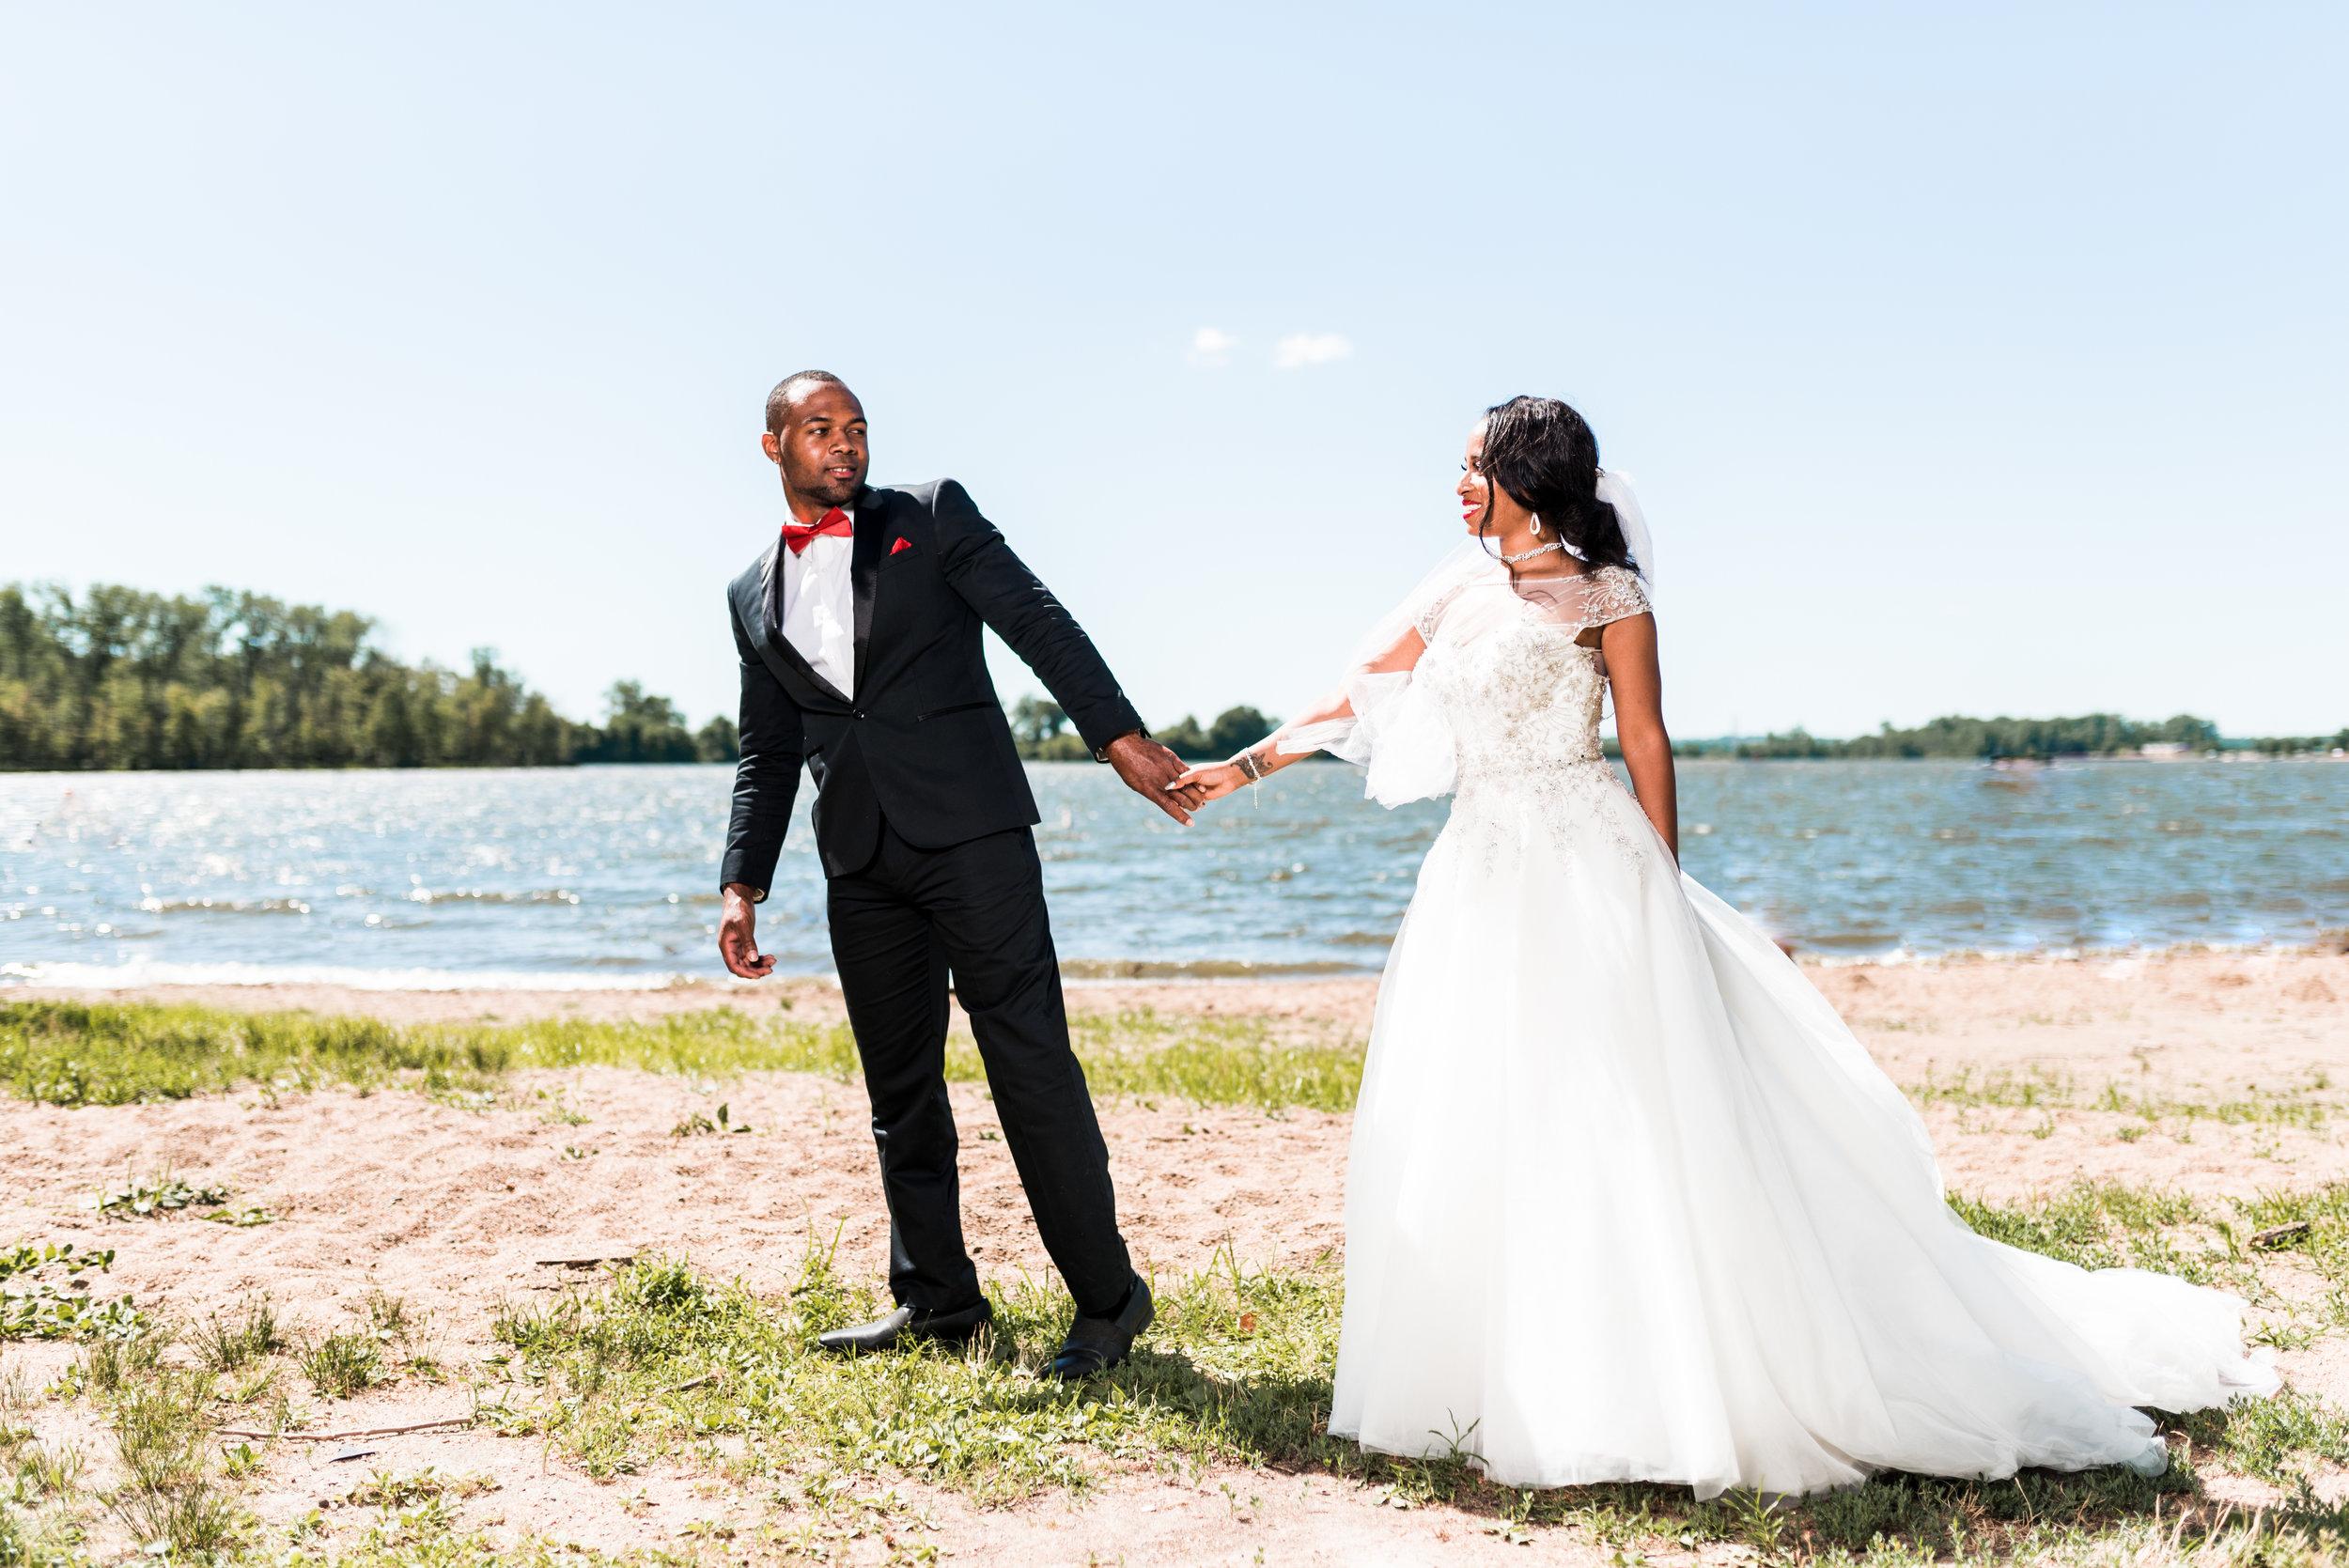 st-louis-wedding-photographer-creve-coeur-lake-90.jpg